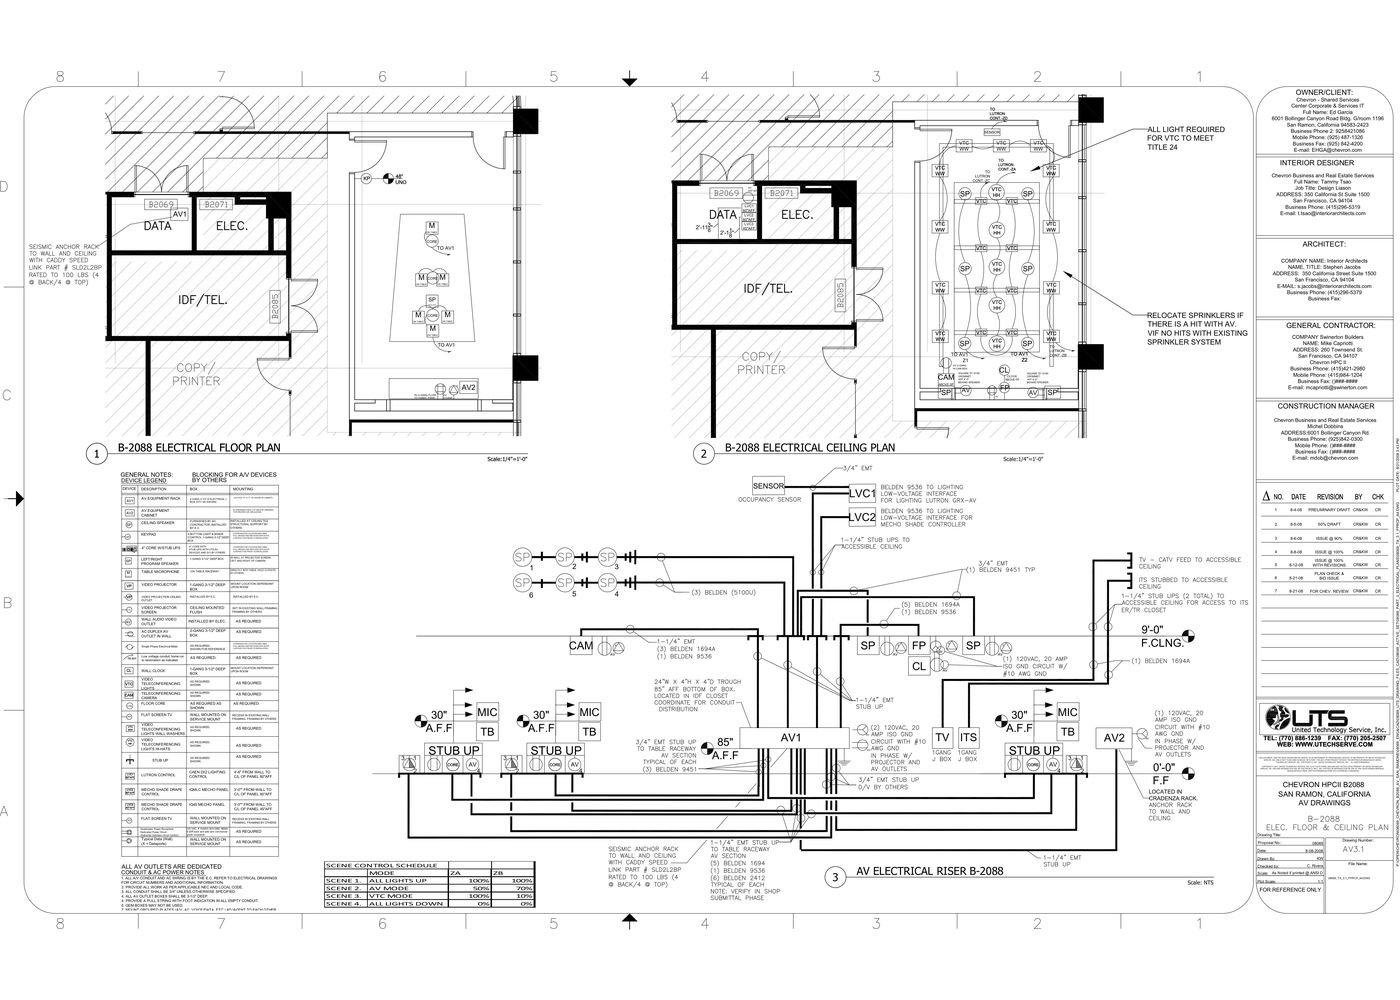 Av System Design Vtc Executive Boardroom By Kelly Wagnon At Coroflot